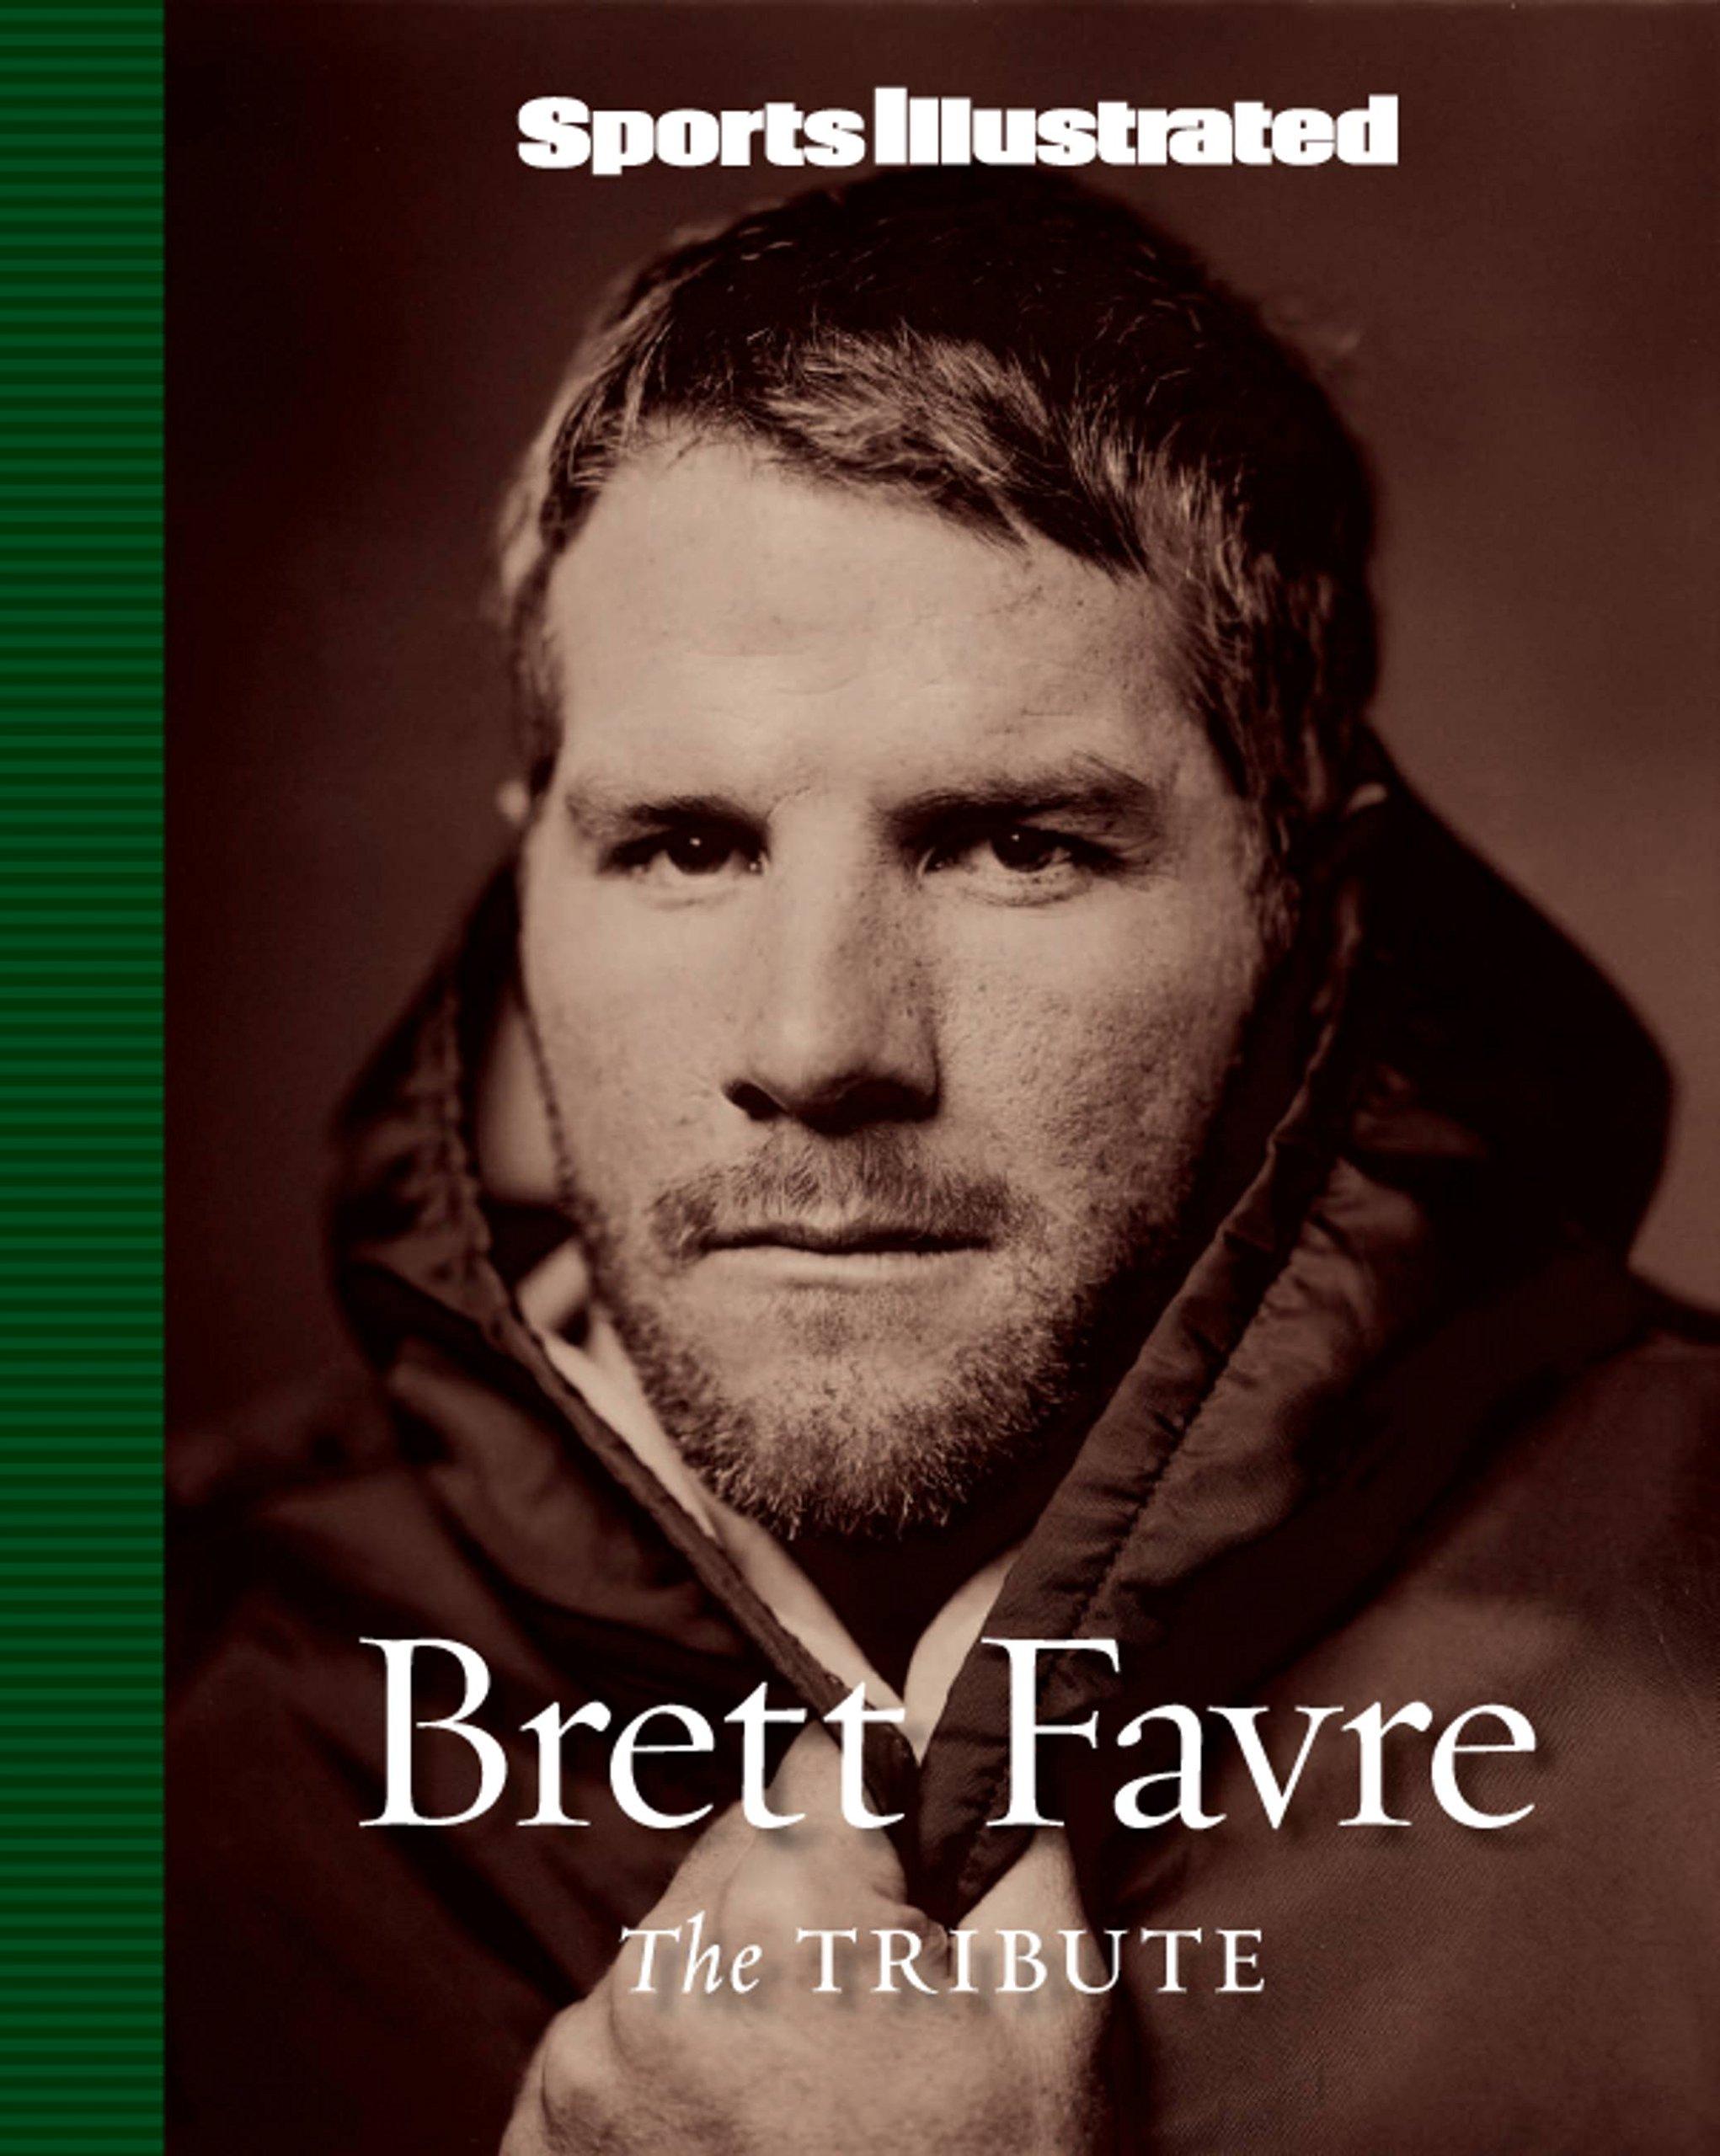 Amazon.com: Sports Illustrated: Brett Favre: The Tribute (9781603200226):  Sports Illustrated: Books